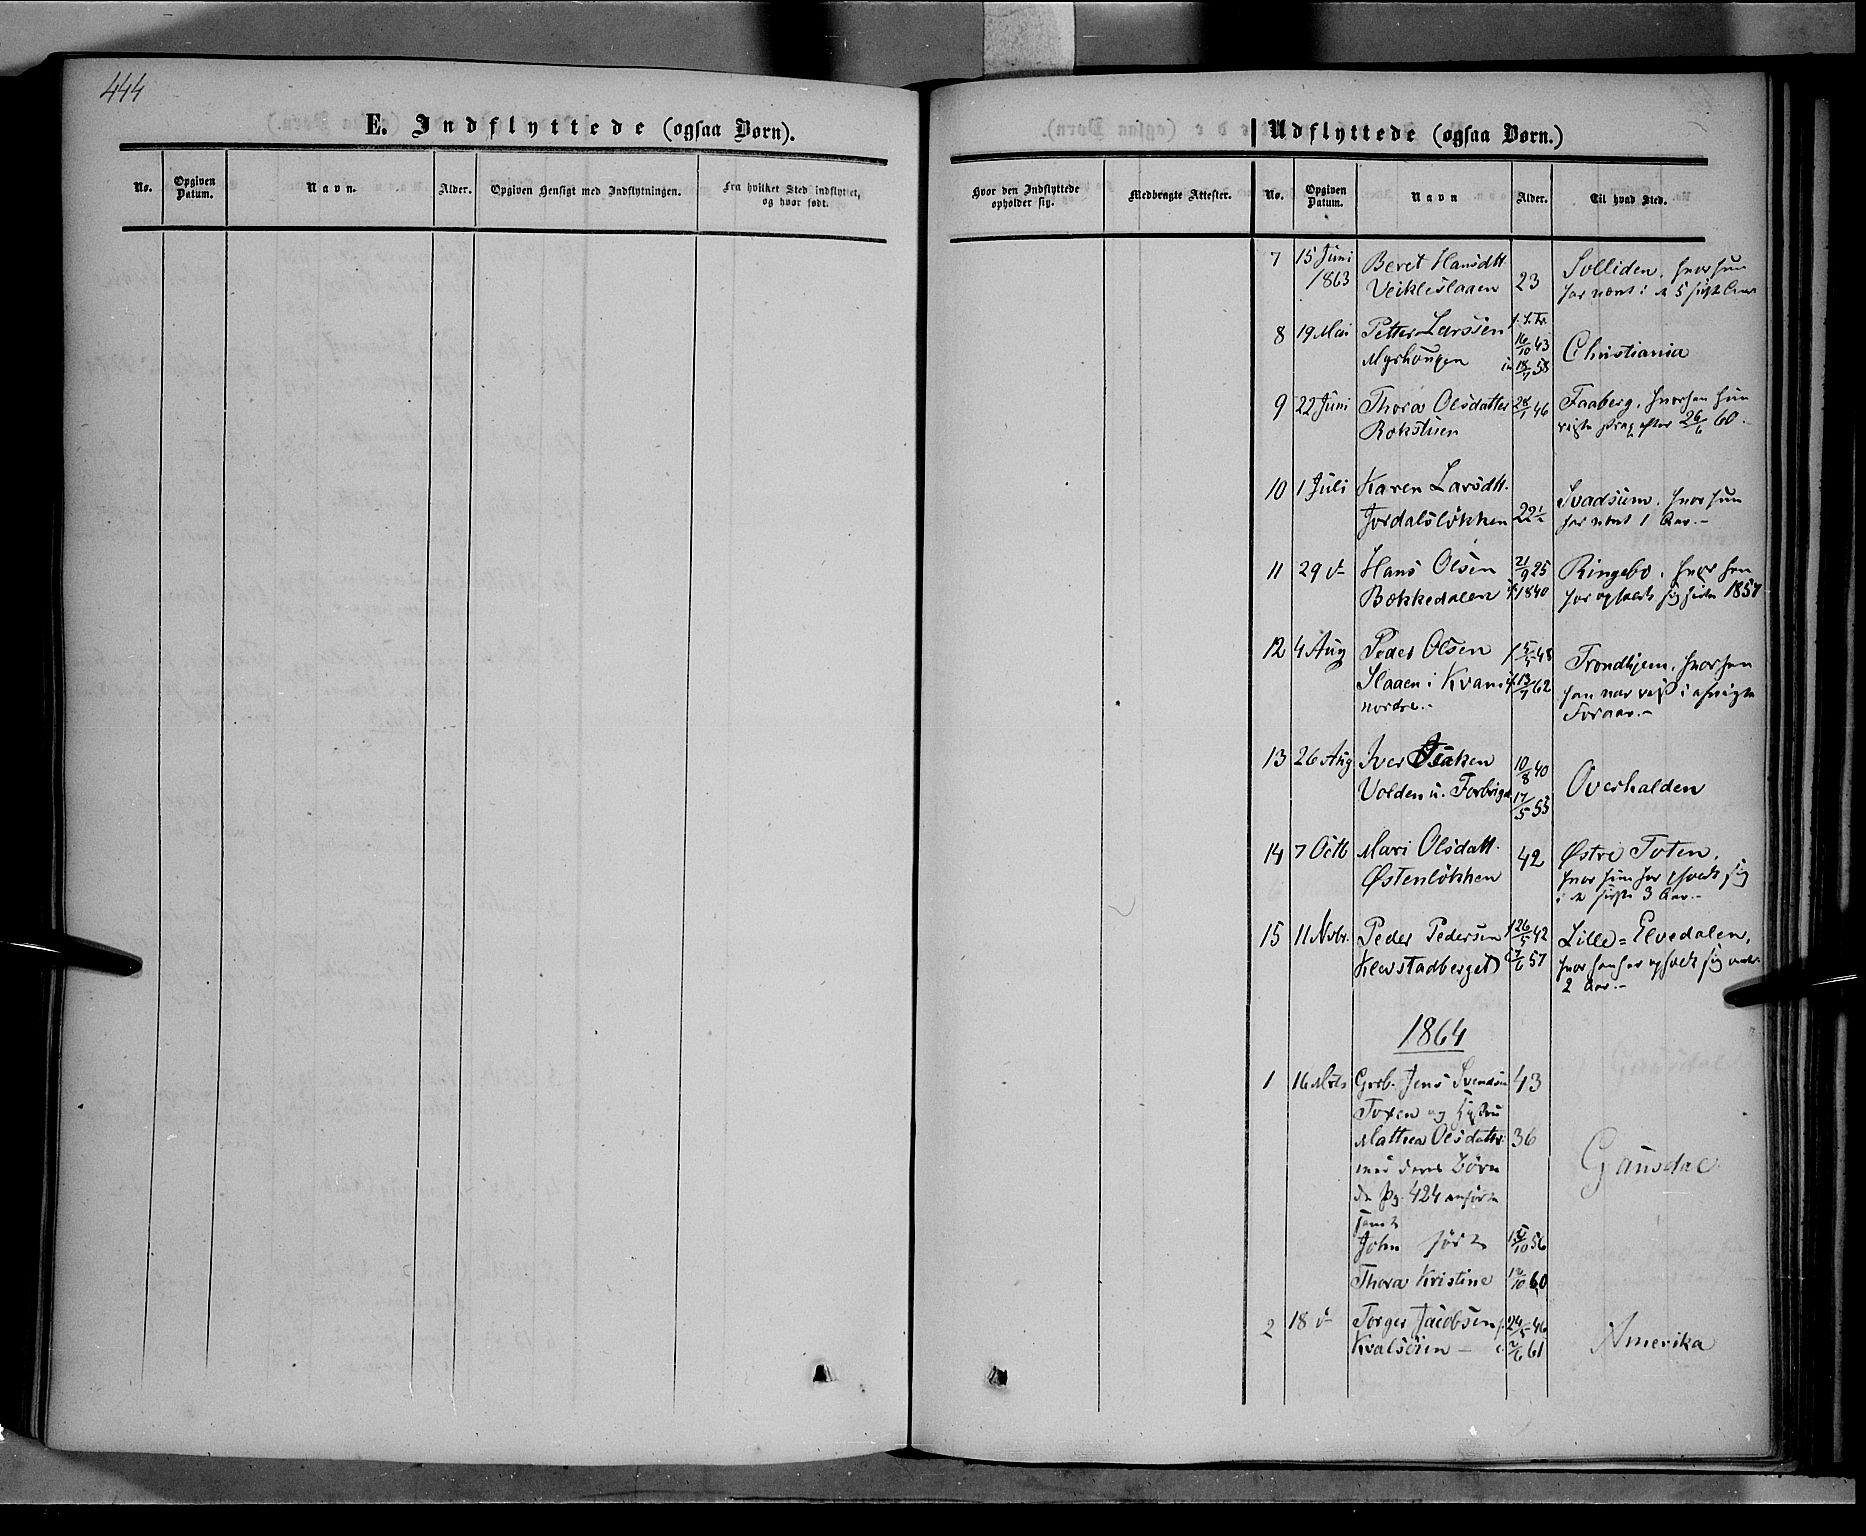 SAH, Nord-Fron prestekontor, Ministerialbok nr. 1, 1851-1864, s. 444